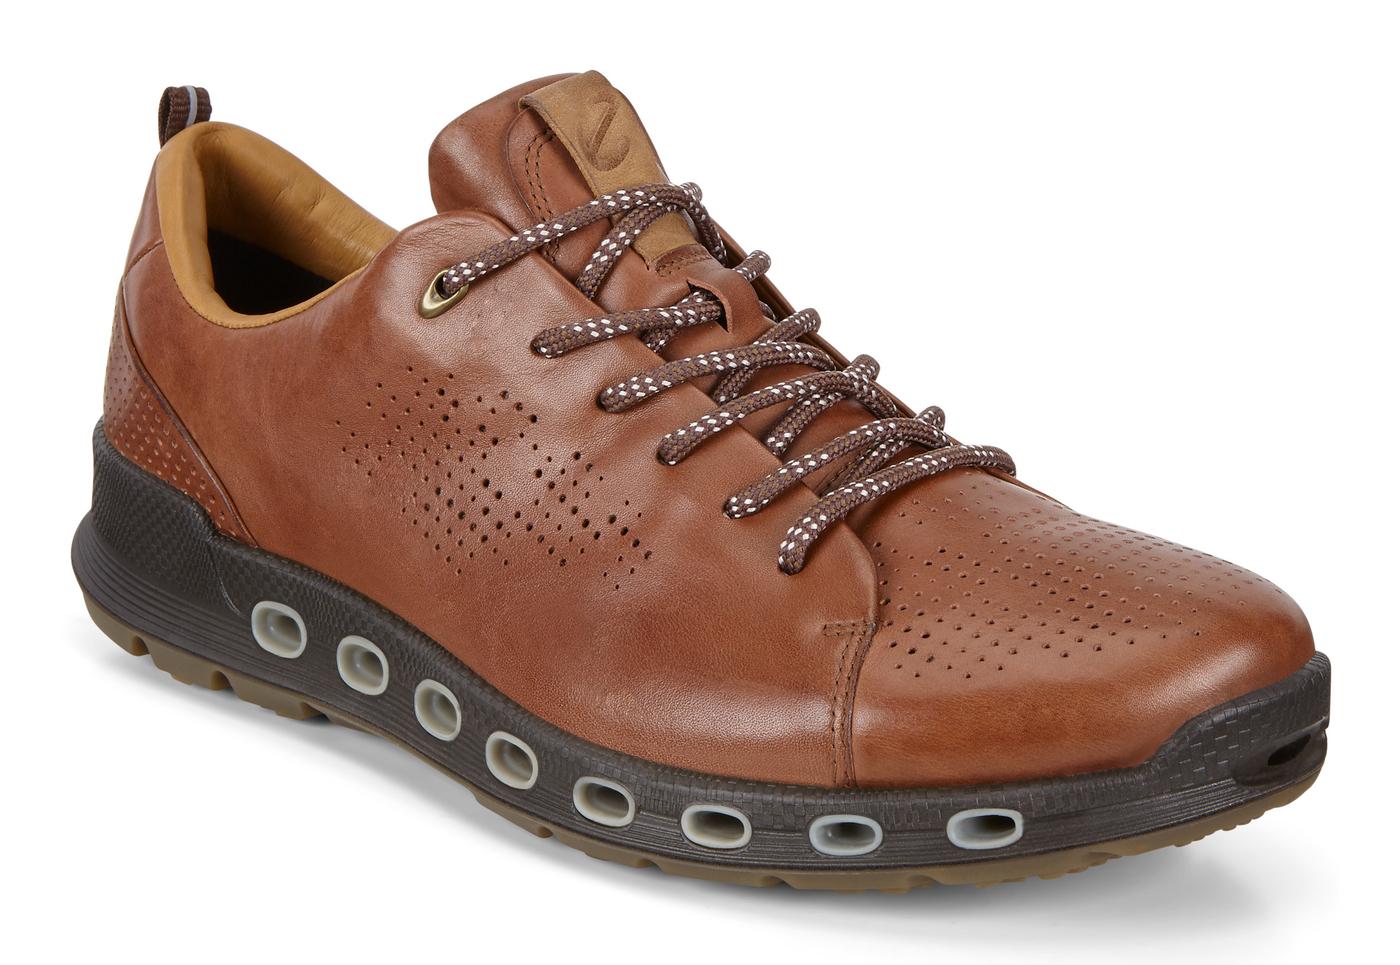 ECCO COOL2.0 Mens Calf Leather Sneaker GTX